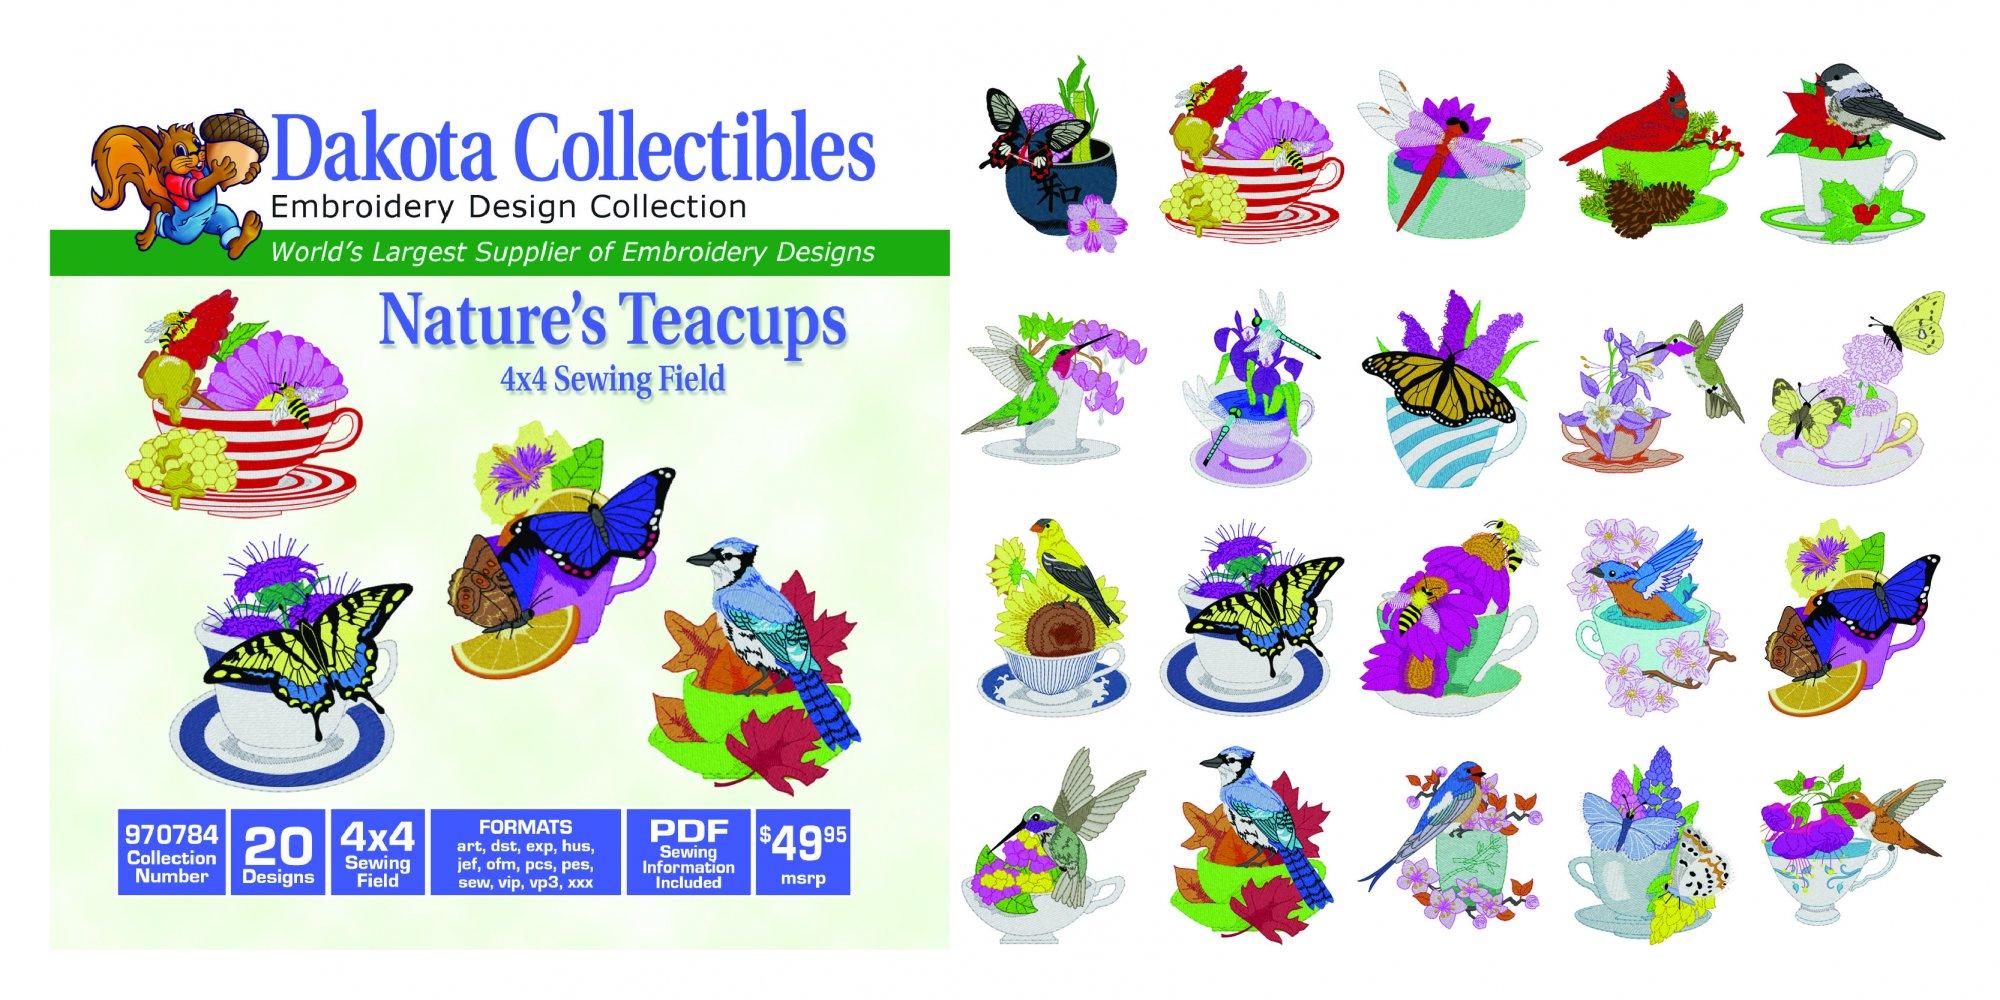 Nature's Teacups (4x4) 970784